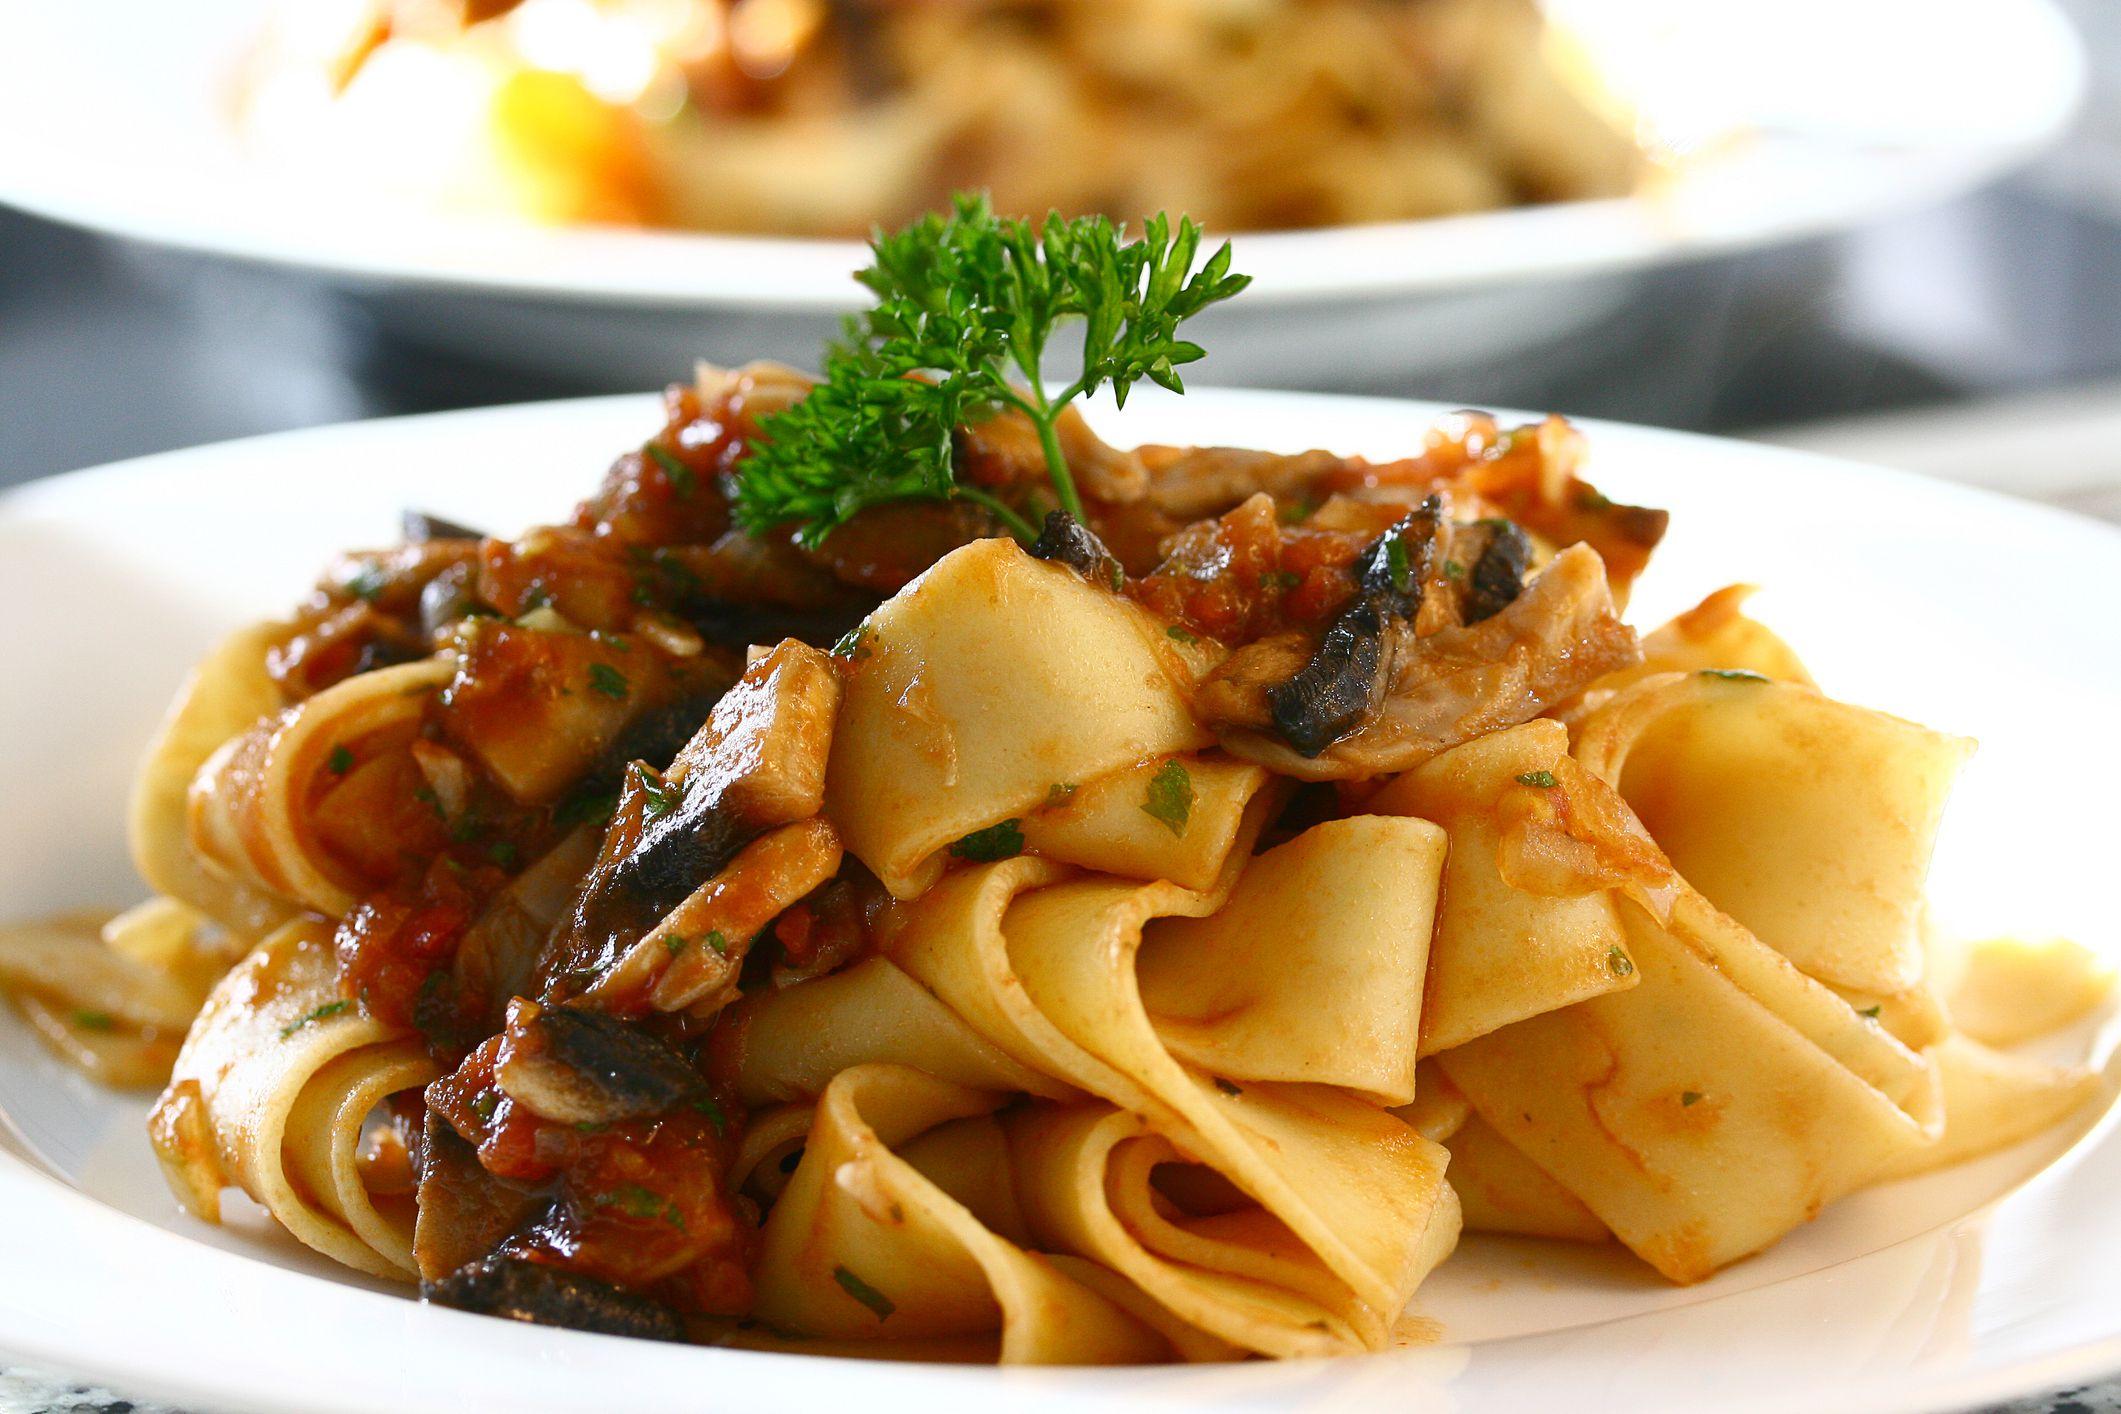 Pappardelle Pasta in Wild Mushroom Sauce (Pappardelle alla boscaiola)